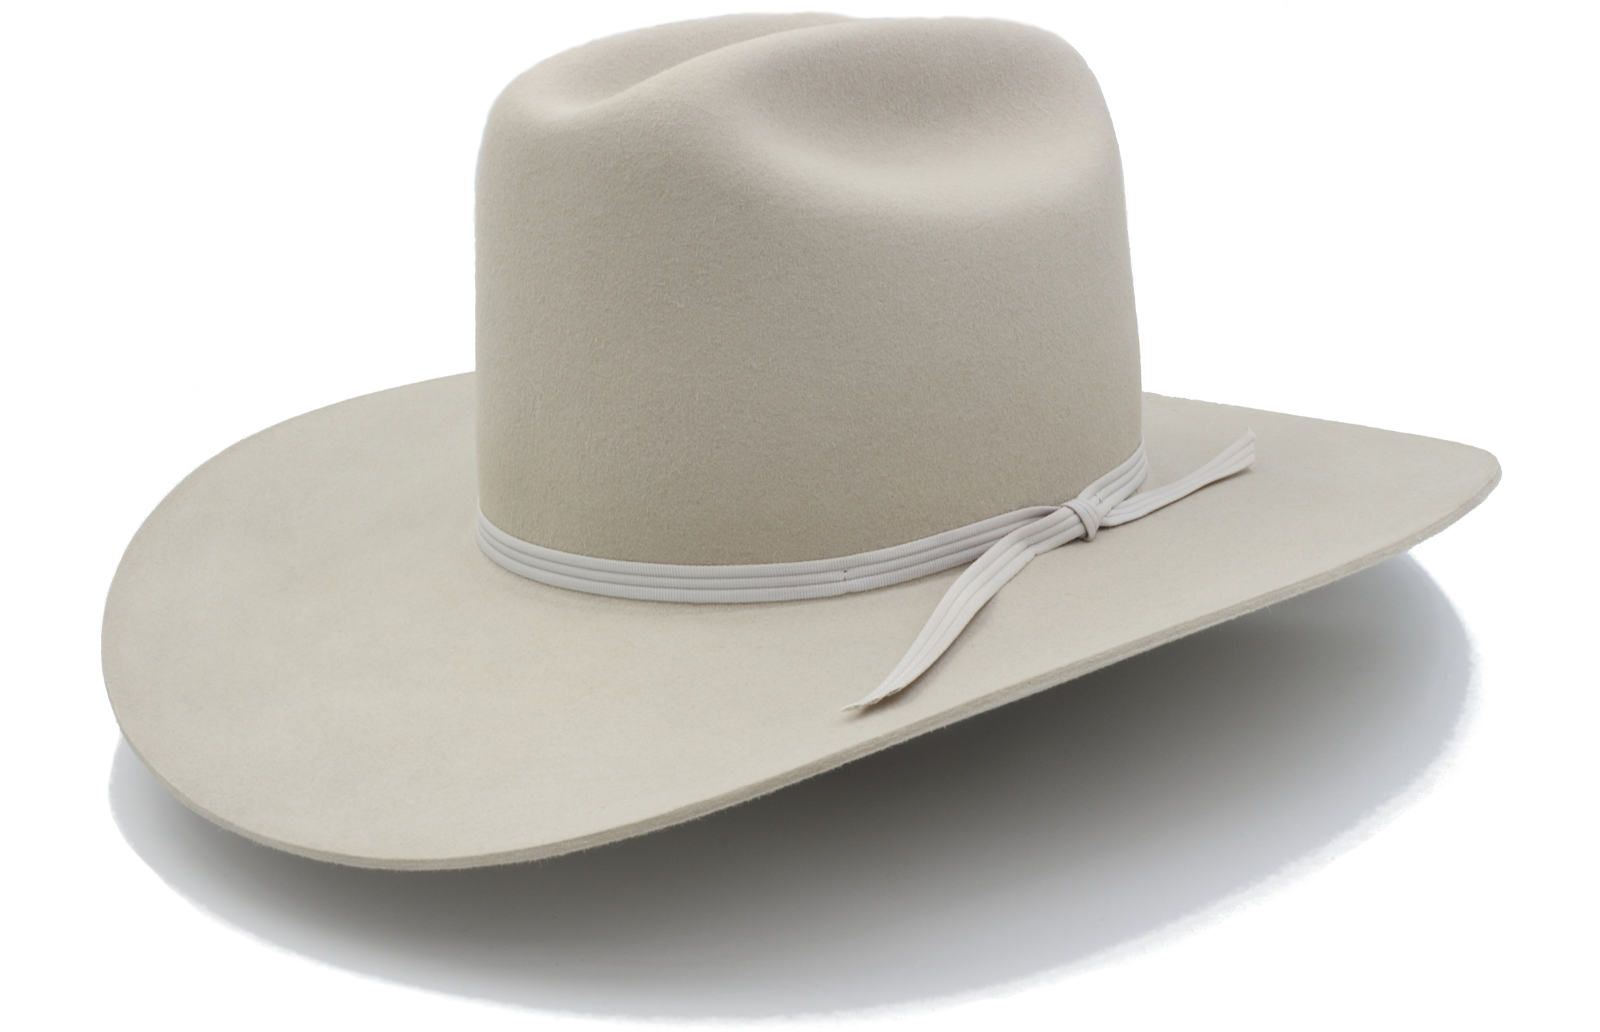 34a22b132e878 Buyer s Guide - Stratton Hats